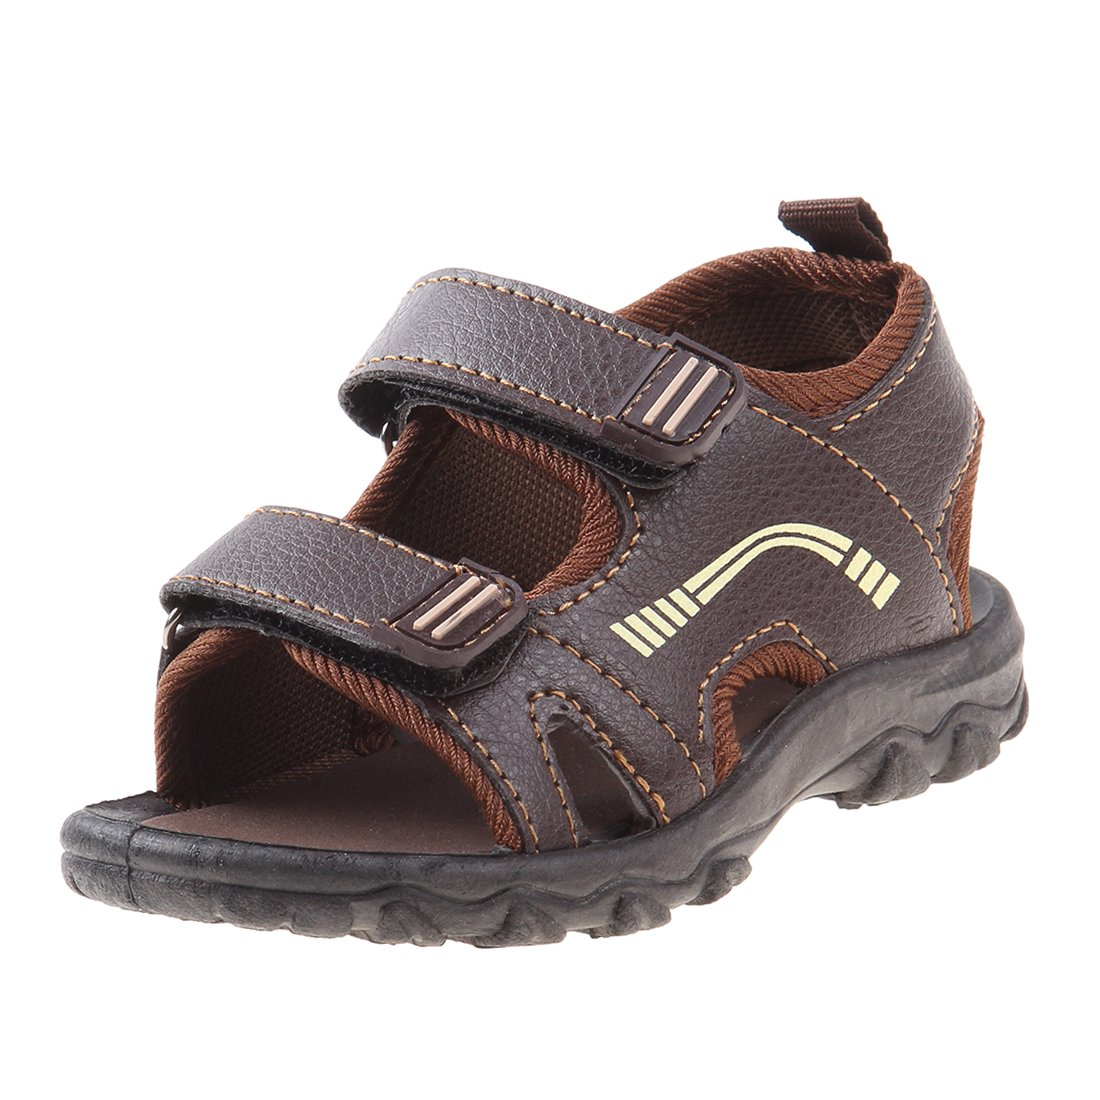 Josmo Boys Outdoor Summer Sandal (Toddler, Little Kid, Big Kid), Brown, 9 M US Toddler'